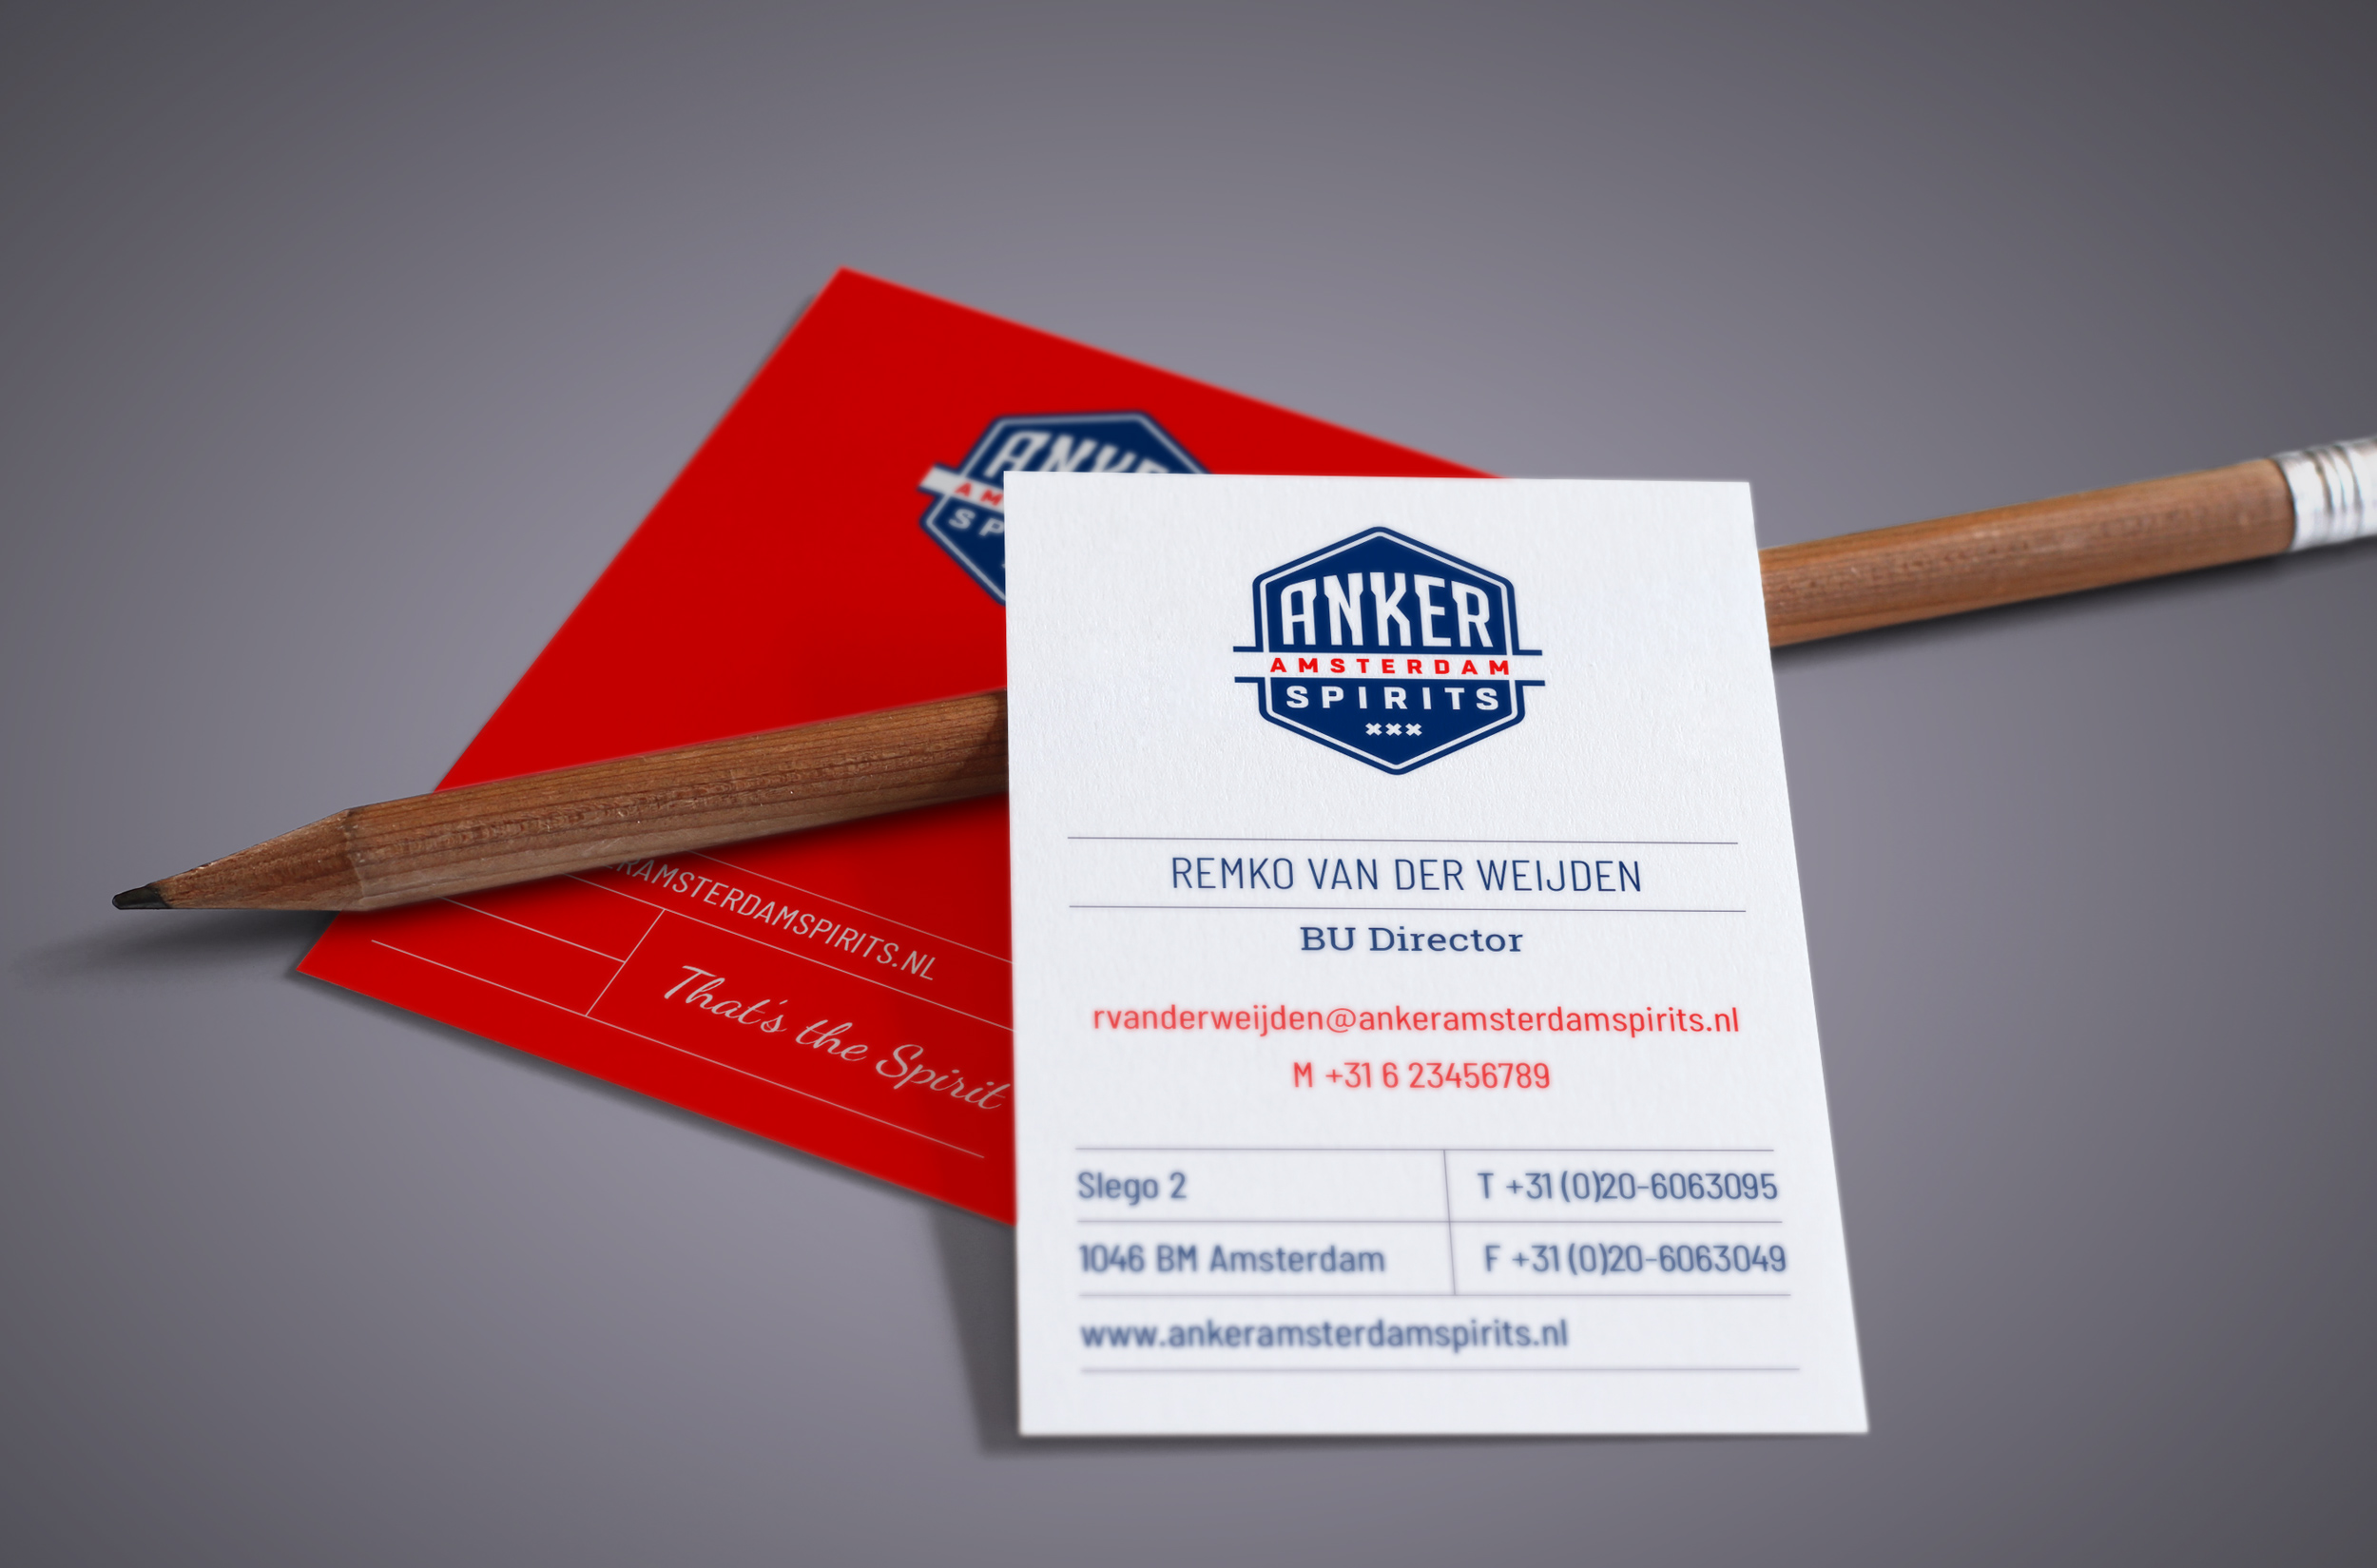 Anker-businesscard